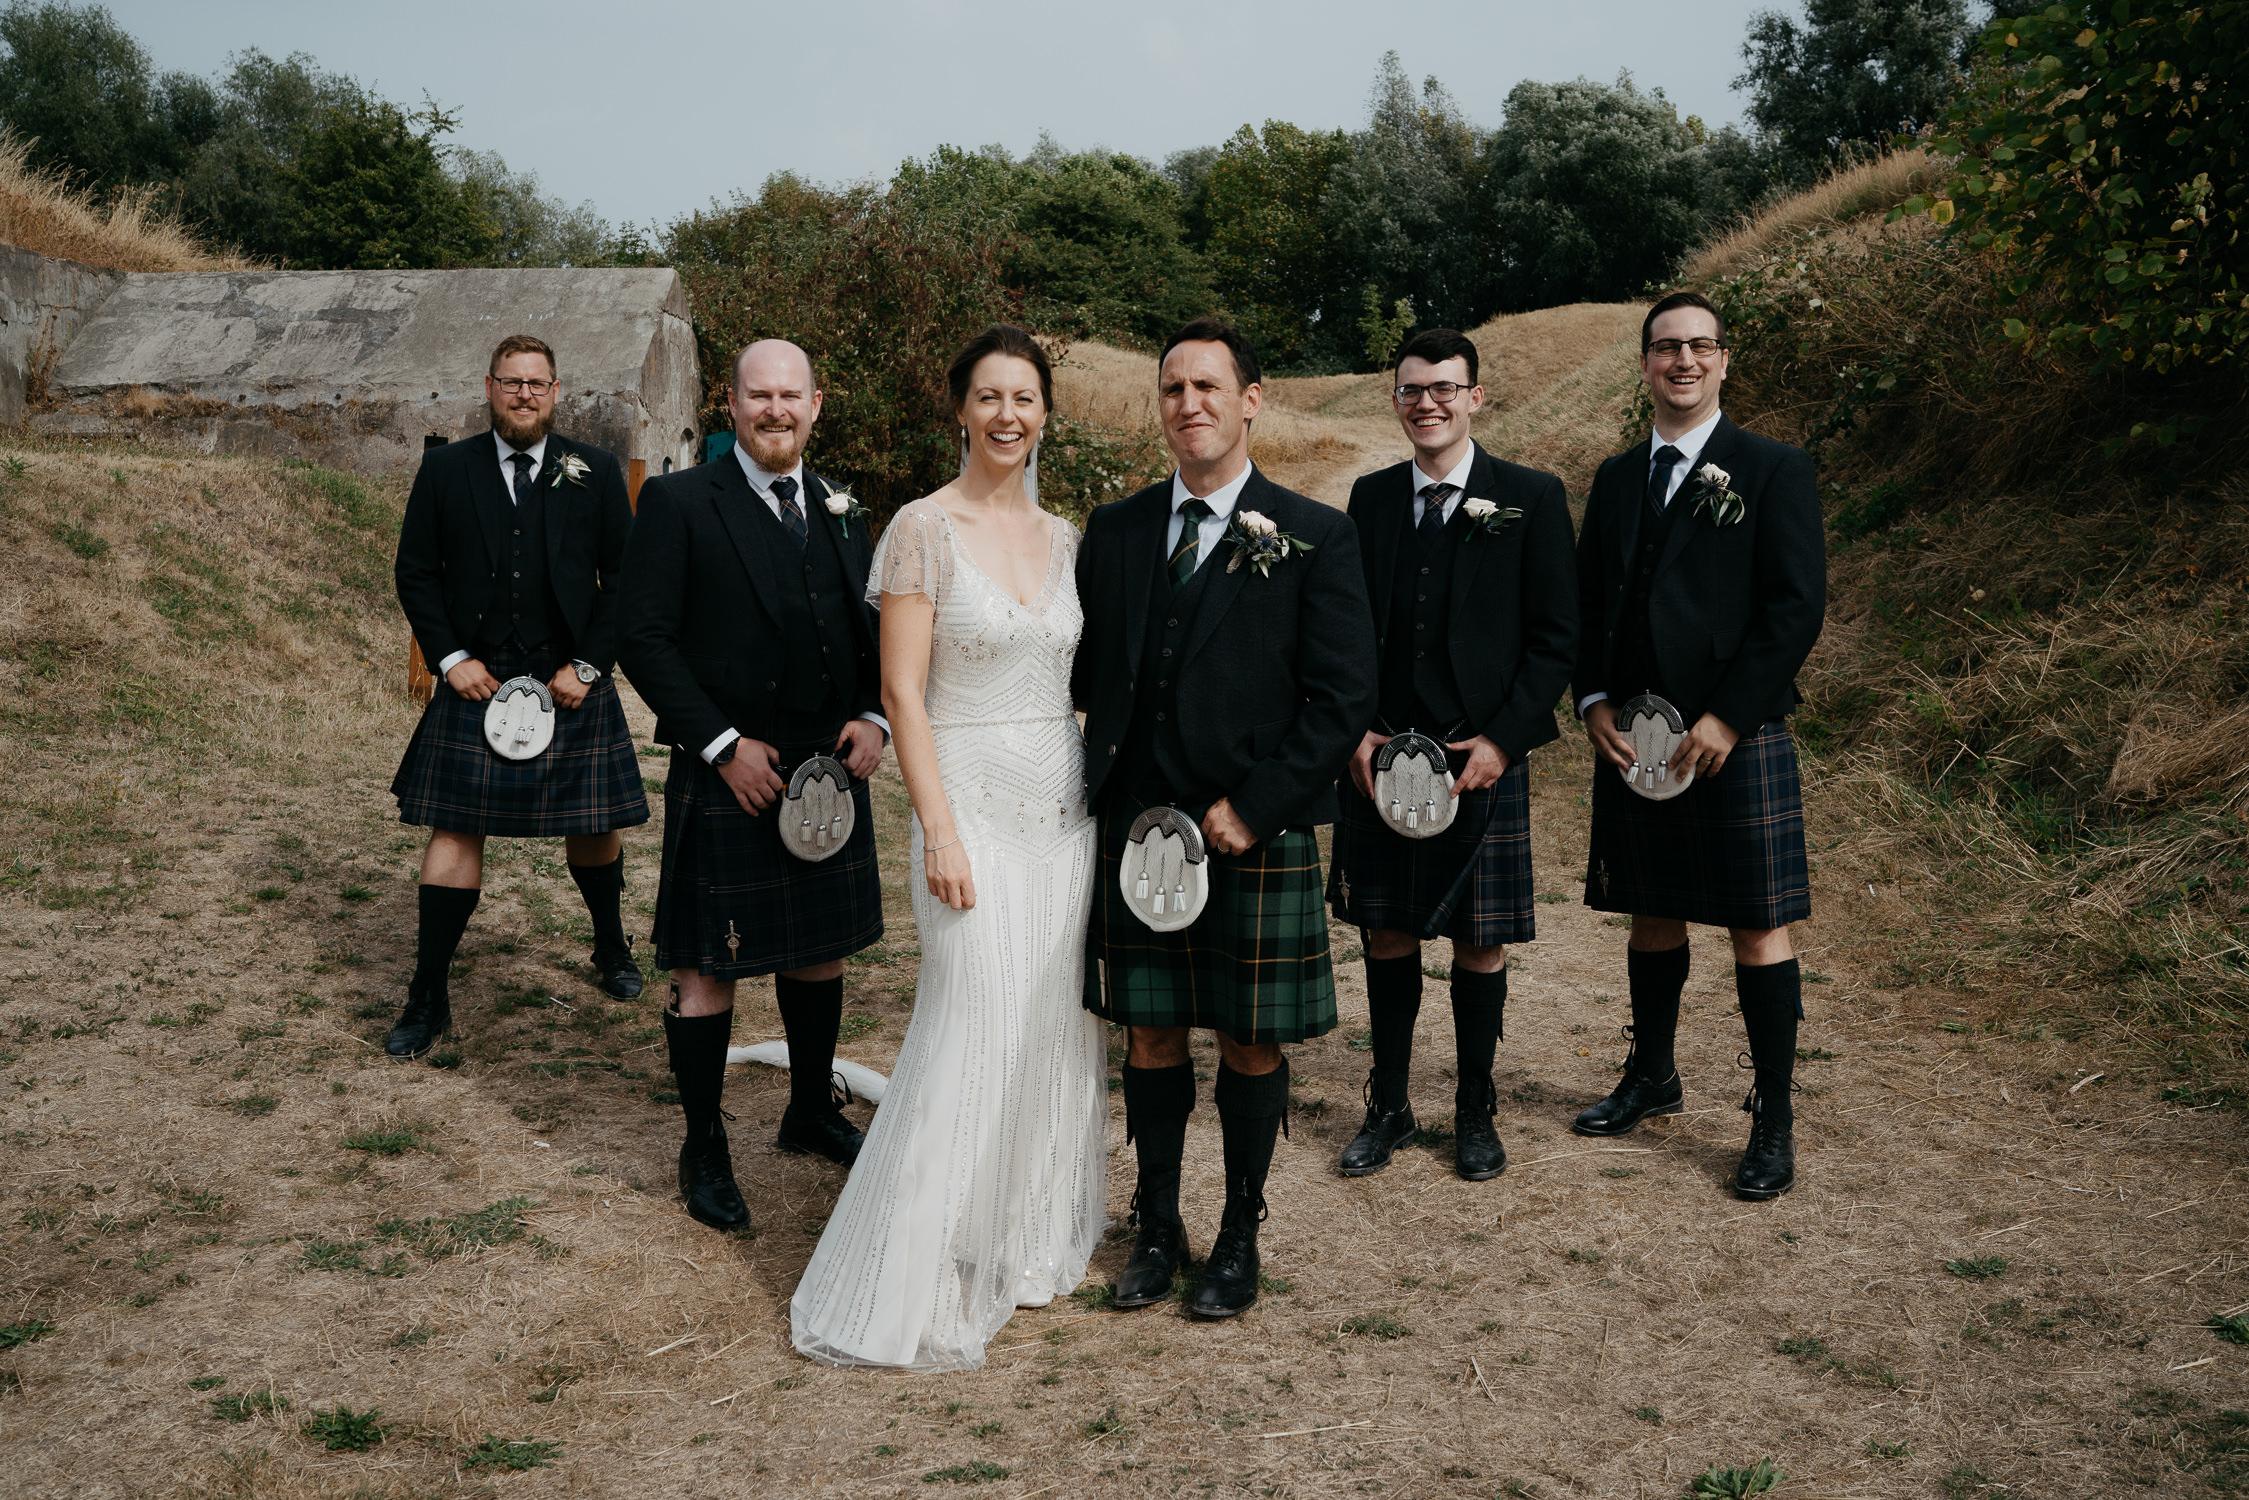 family portrait photoshoot by destination wedding photographer mark hadden